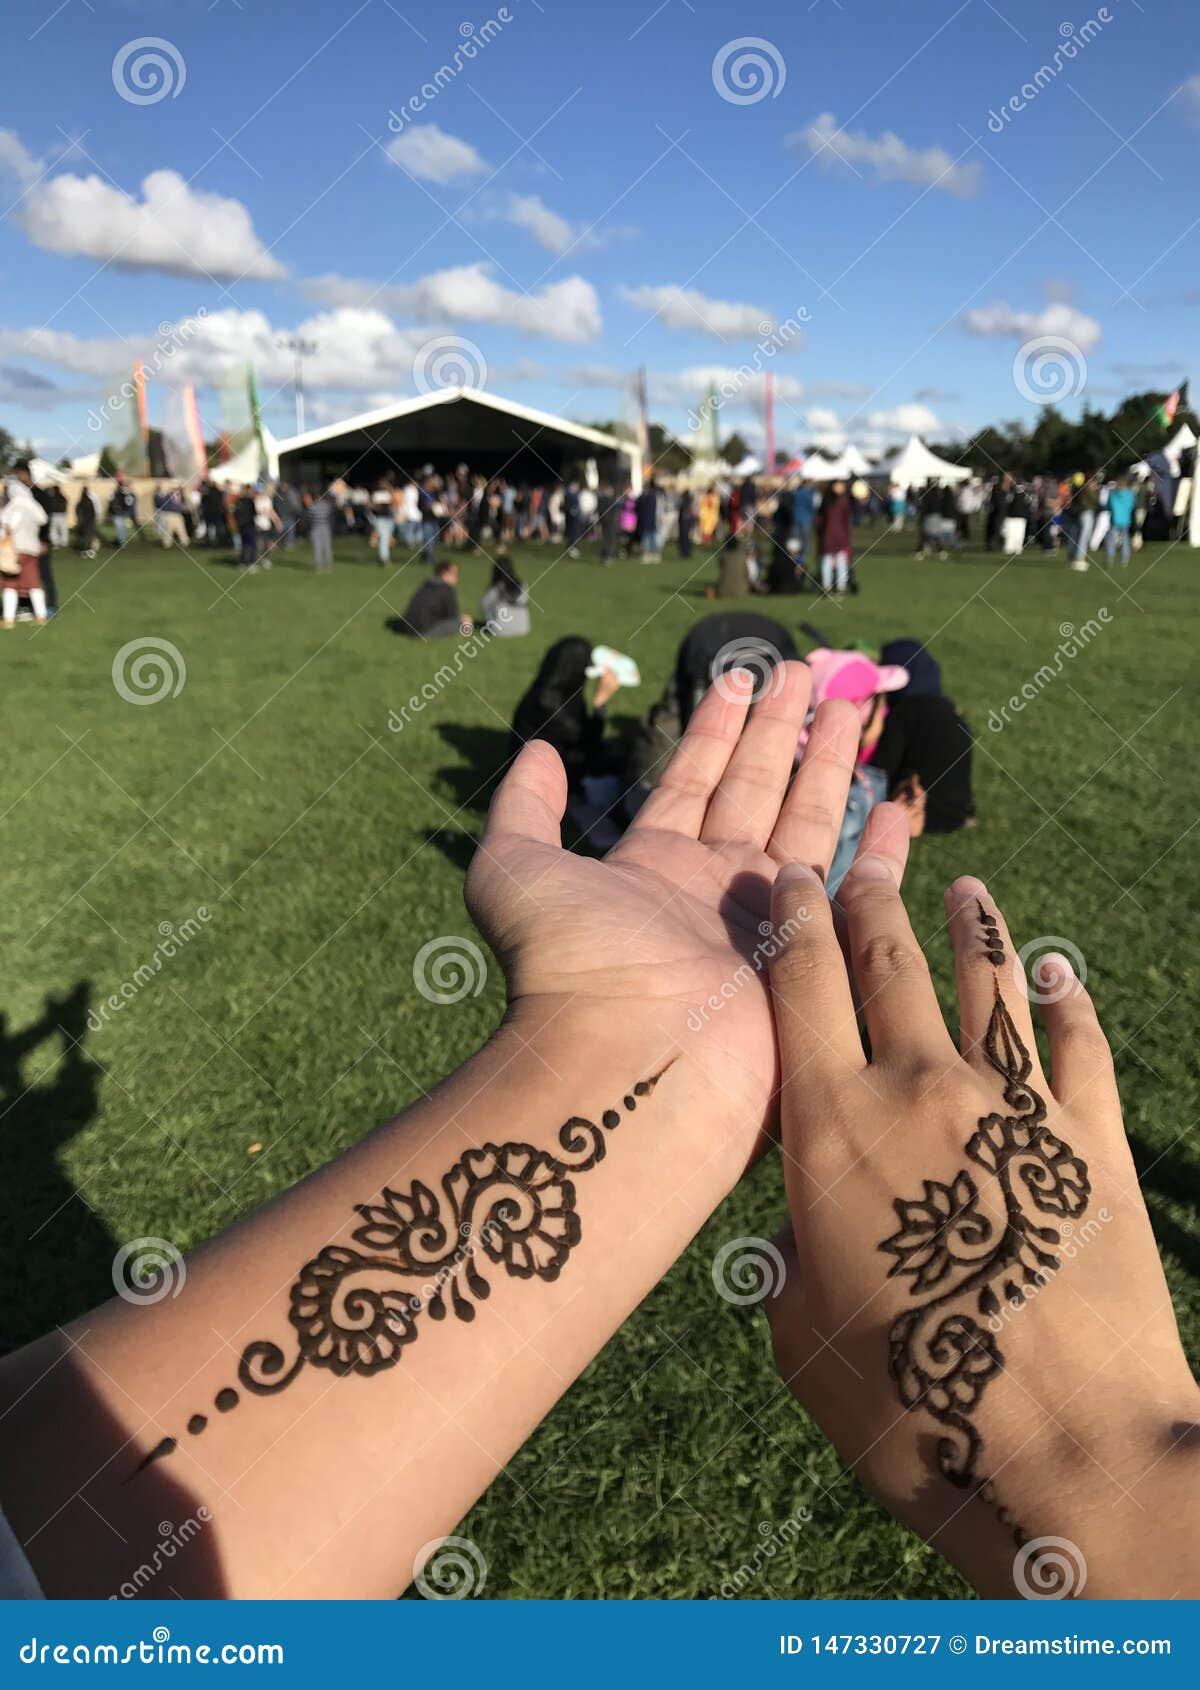 Tatuaggio sulle mani